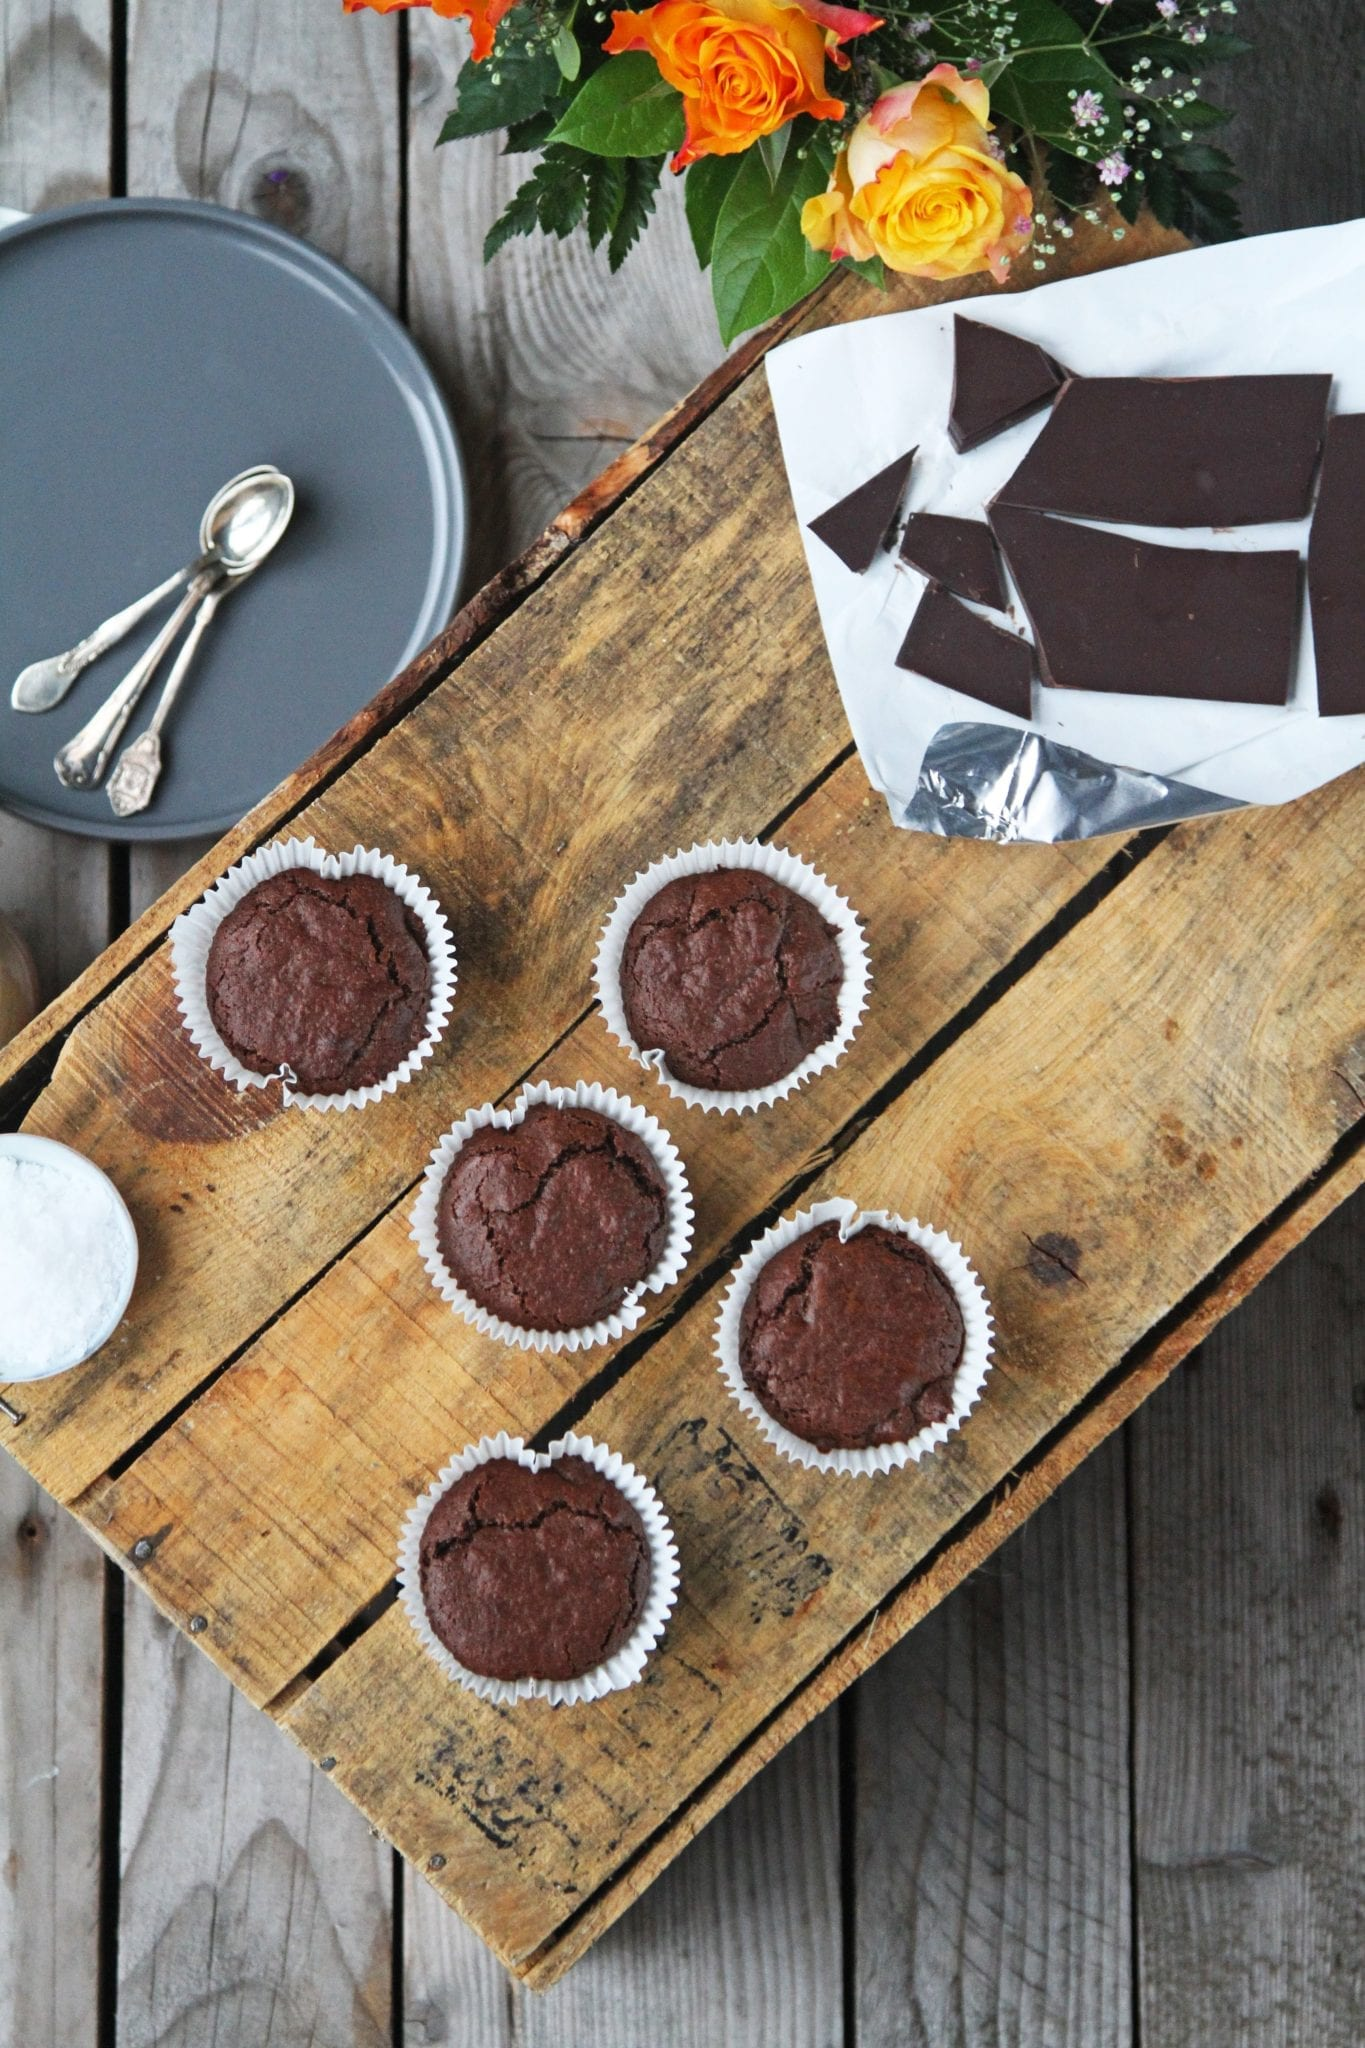 IMG 2517 Brownie muffins - chokolade himmel